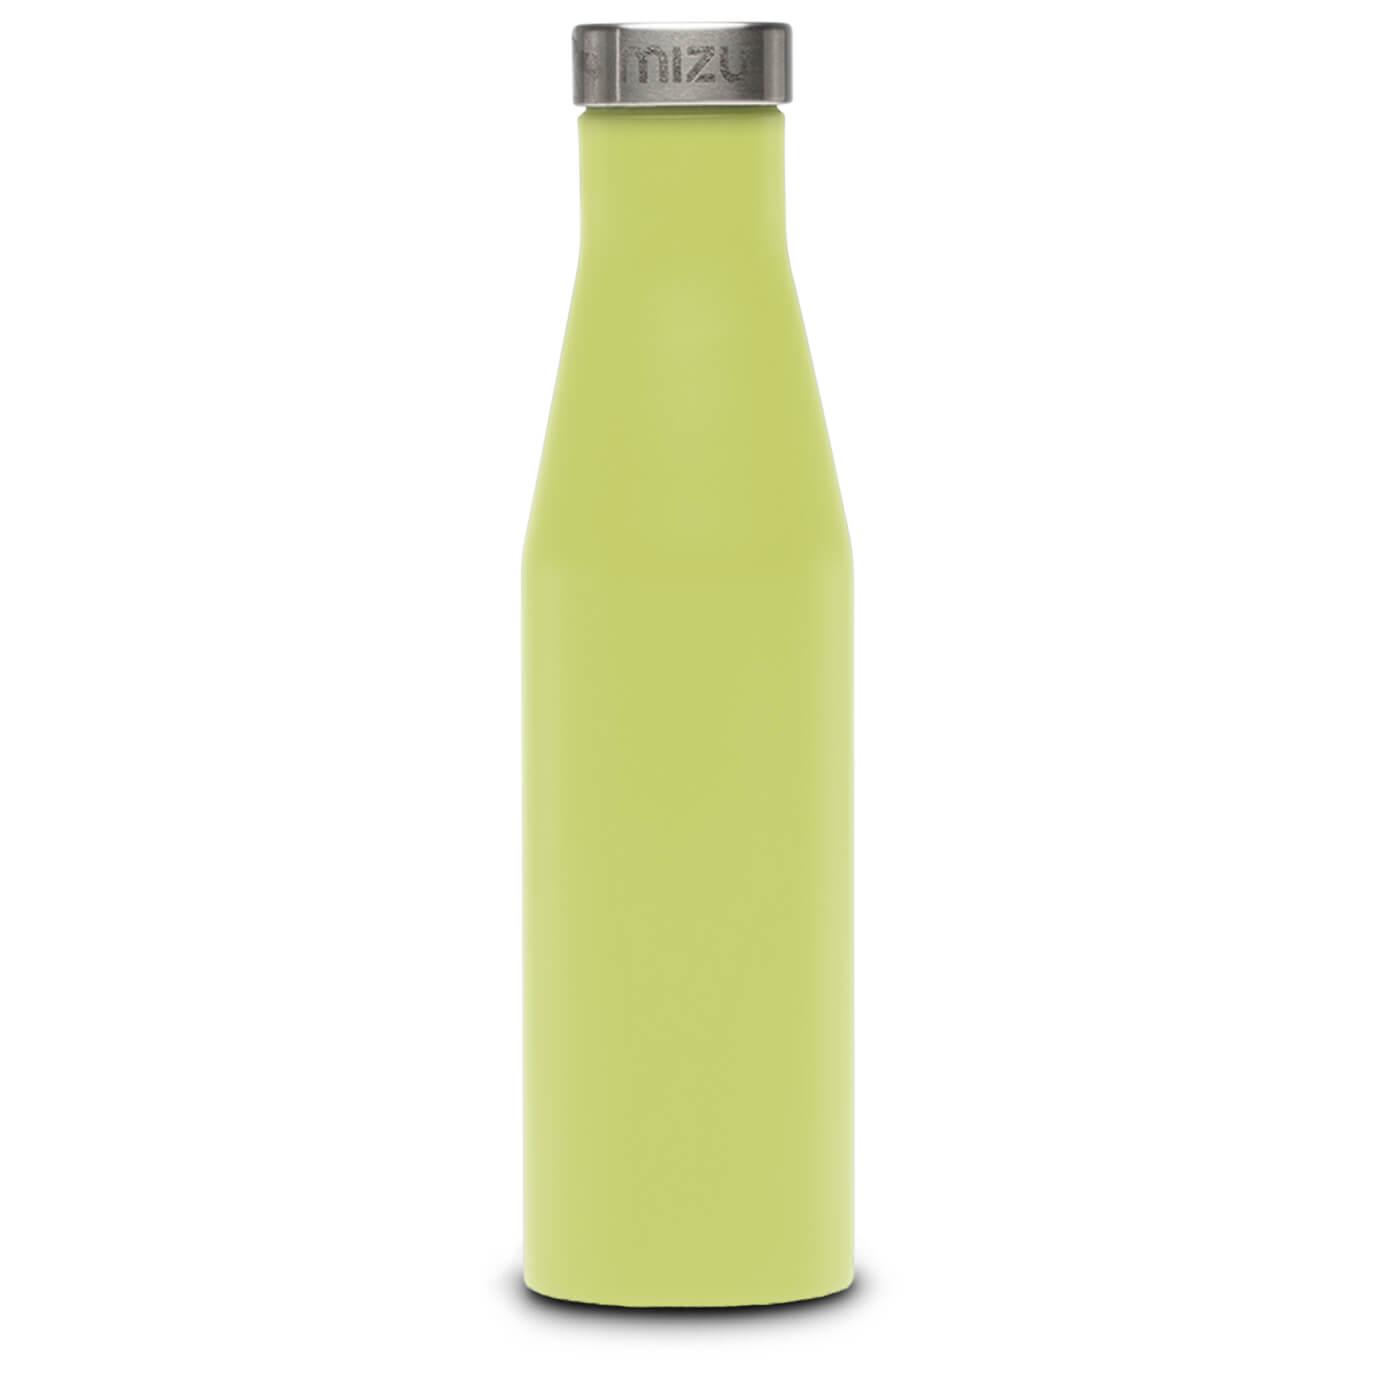 7846c8ac98 Mizu S6 - Insulated Bottle | Buy online | Alpinetrek.co.uk